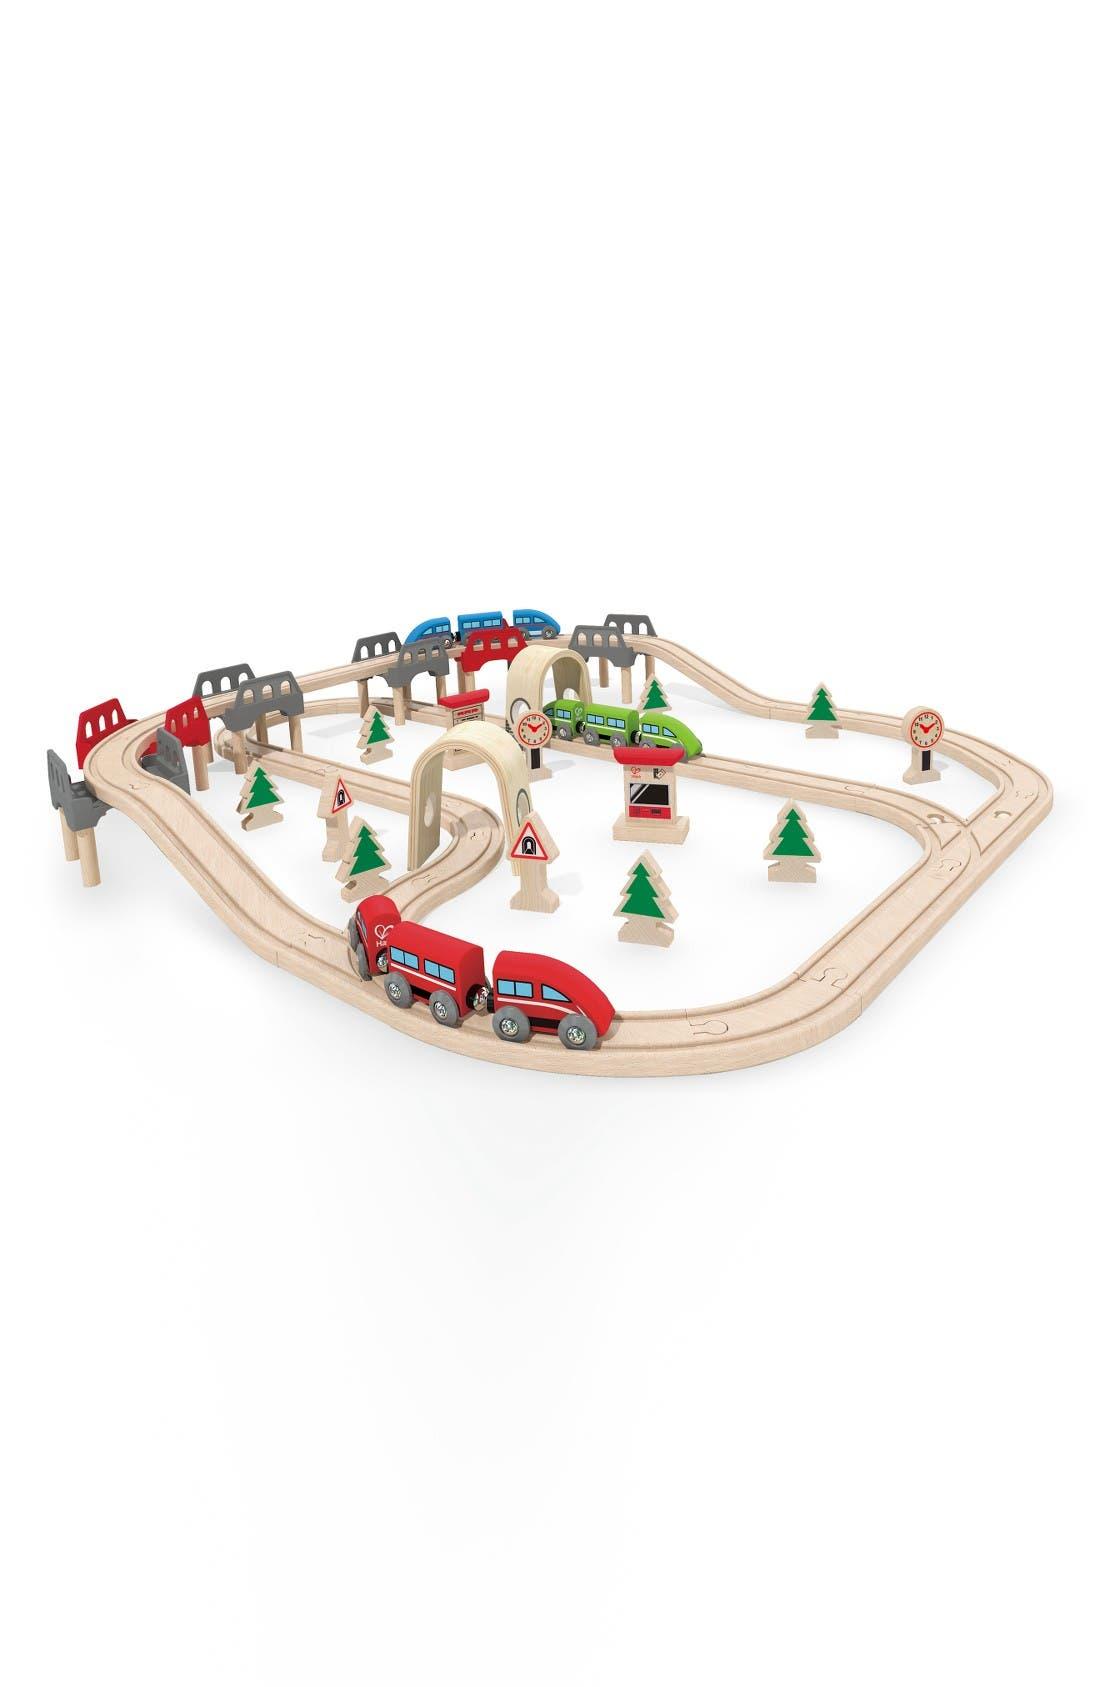 High & Low Railway Set,                         Main,                         color, Multi